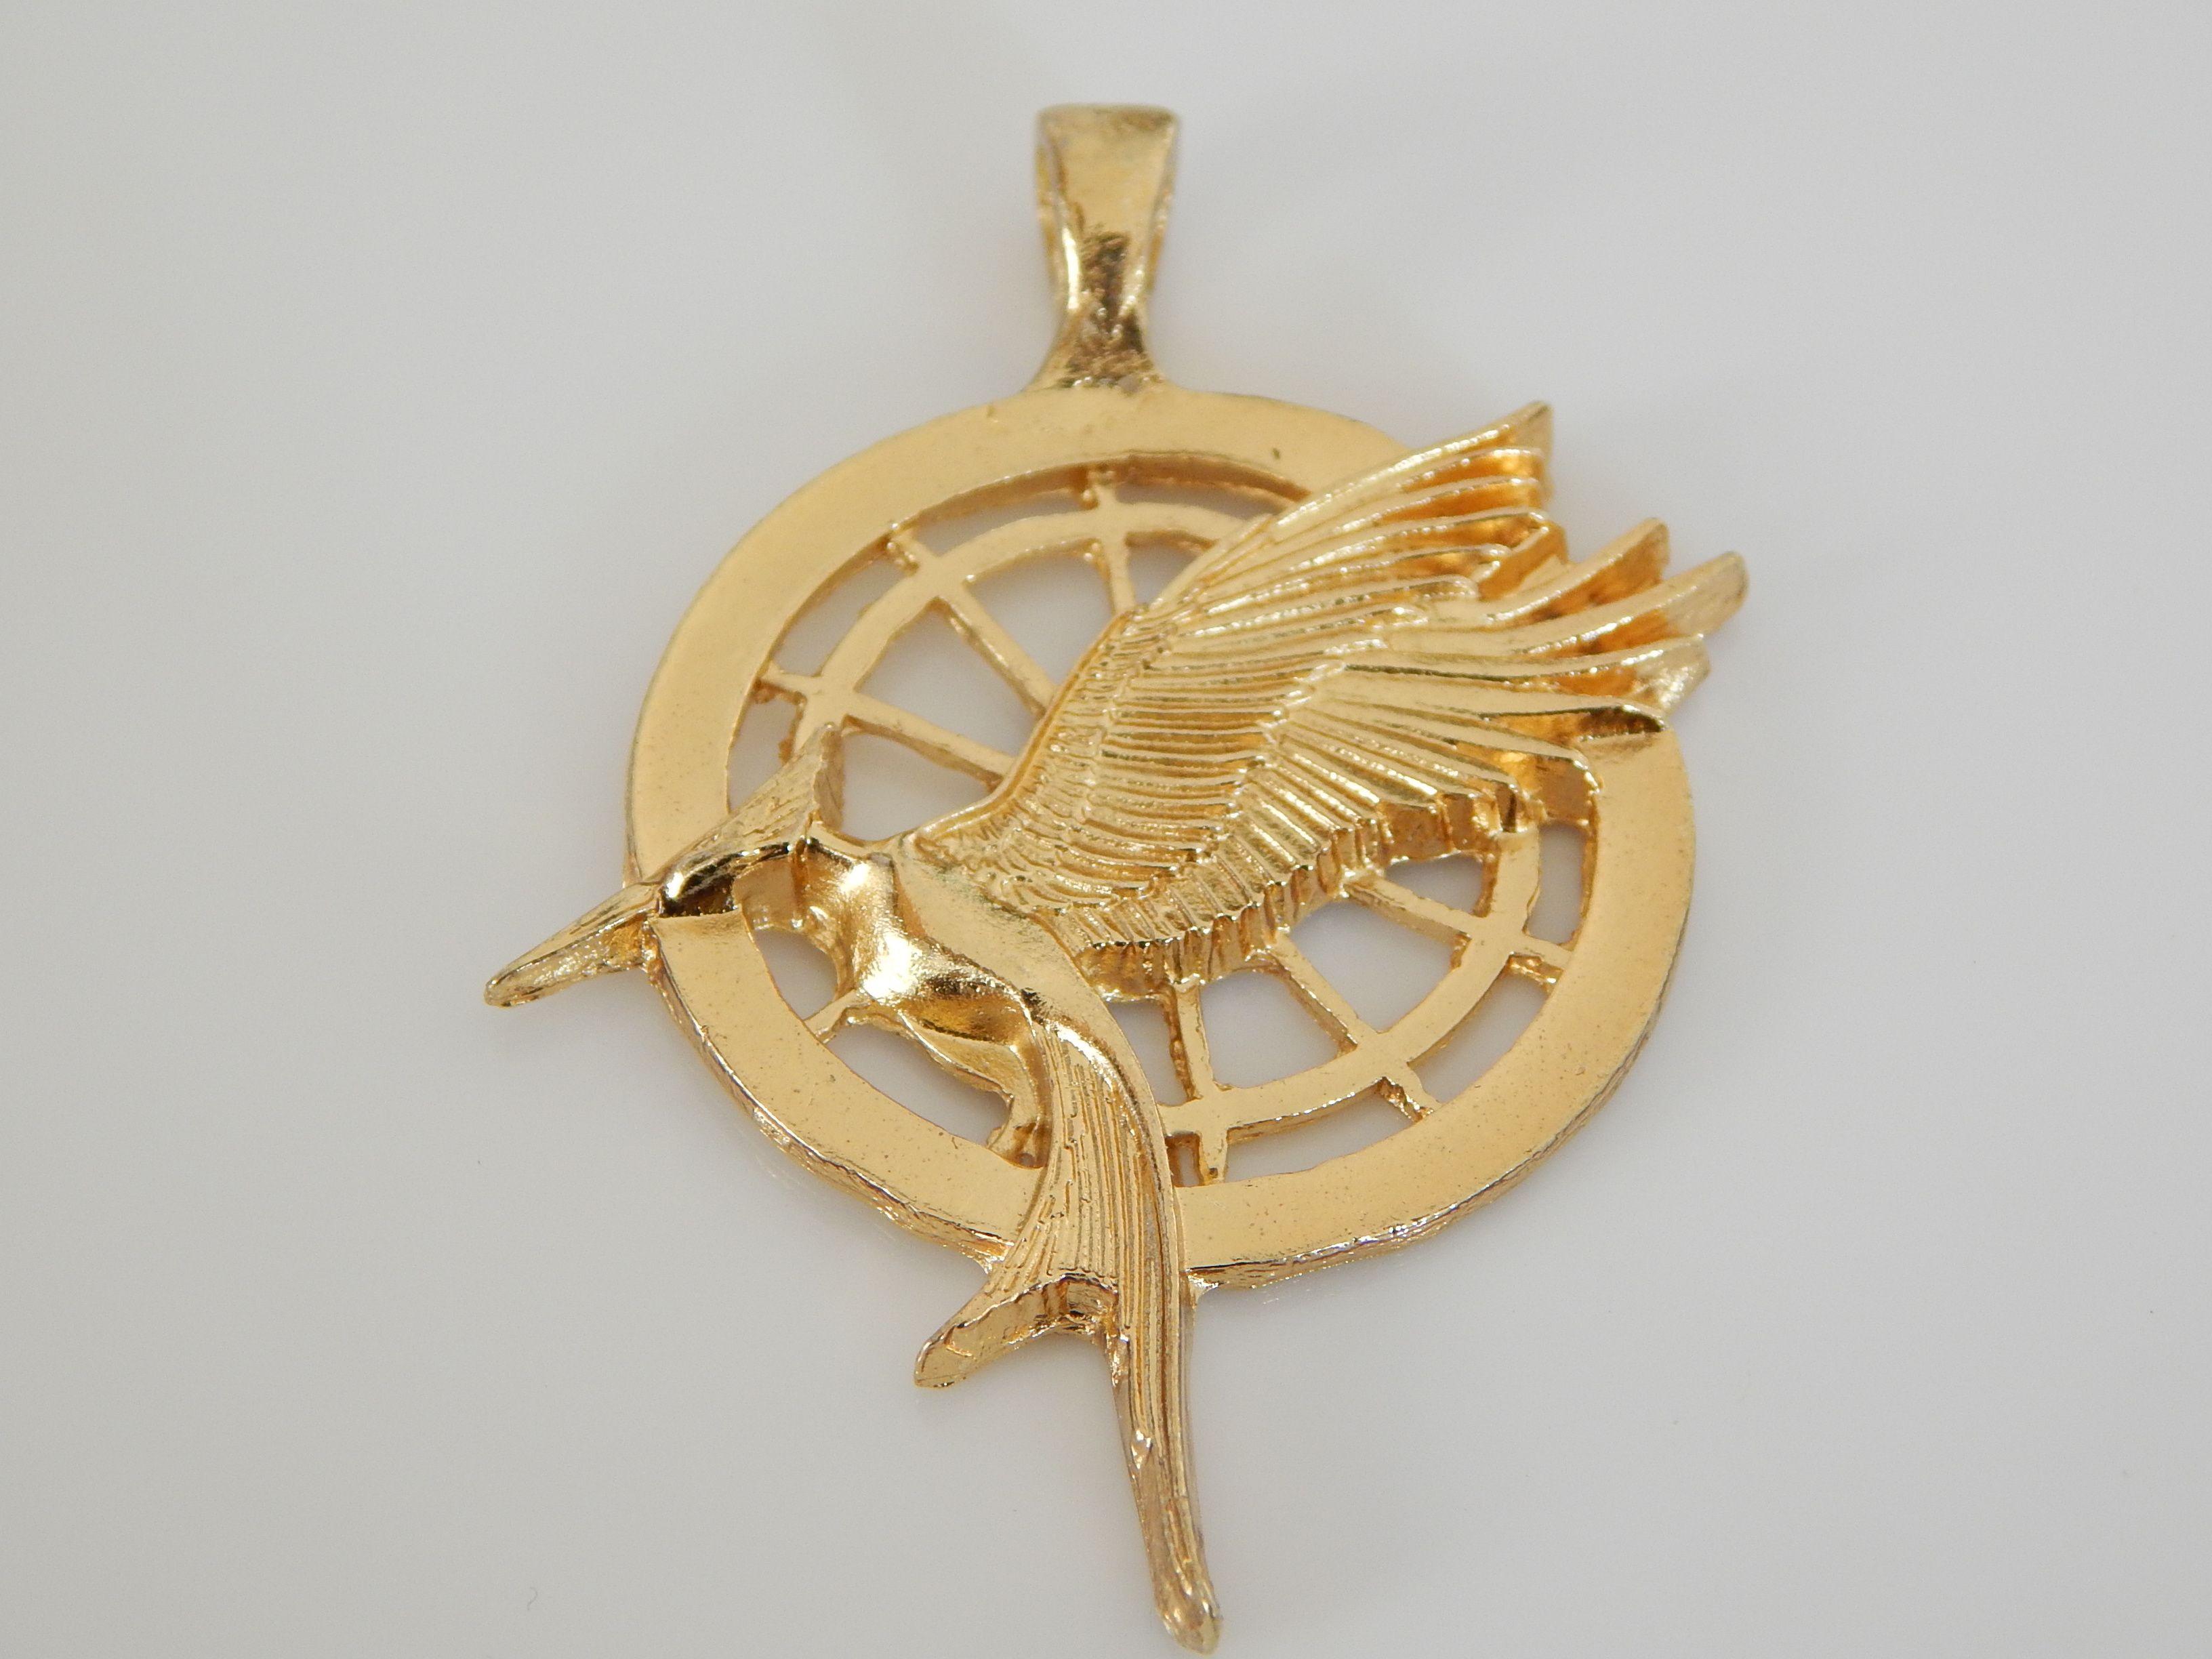 Sinsajo dije para collar dorado, medida 3.5cm de diámetro, HER0011  precio x pieza $18, HER0012-1/2 docena $99, HER0013- 1 docena $170